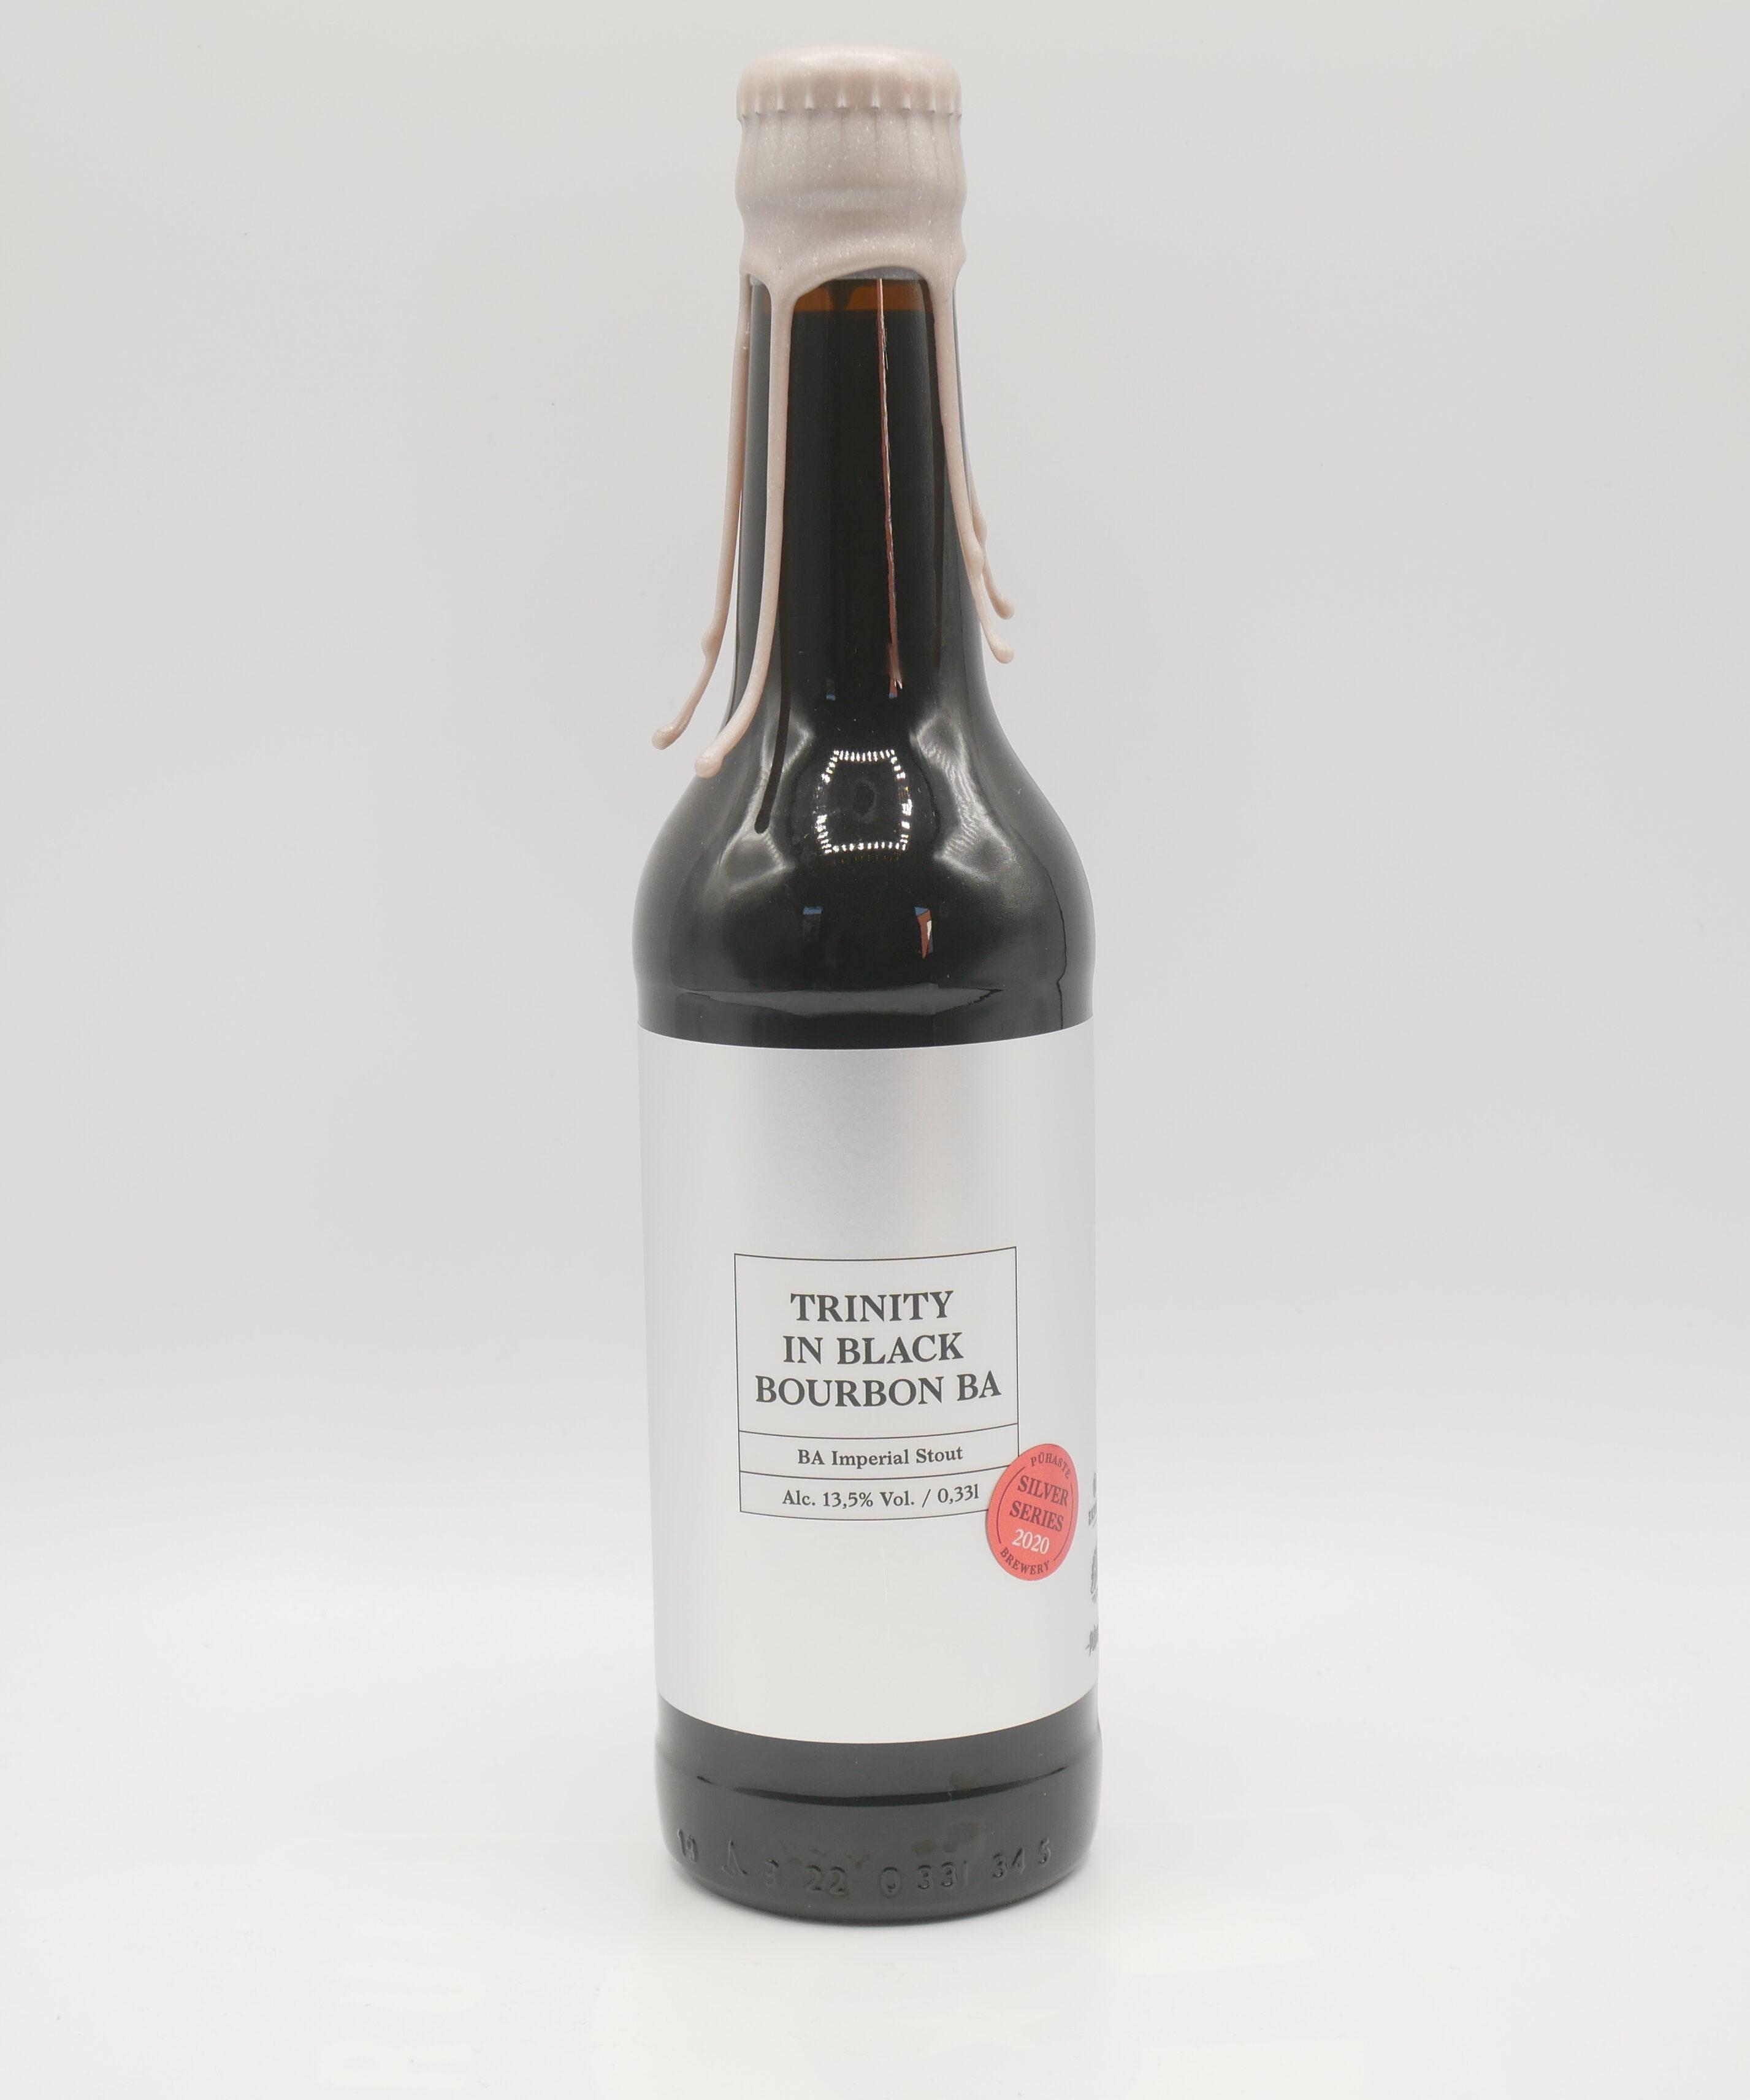 Image Trinity In Black Bourbon Ba